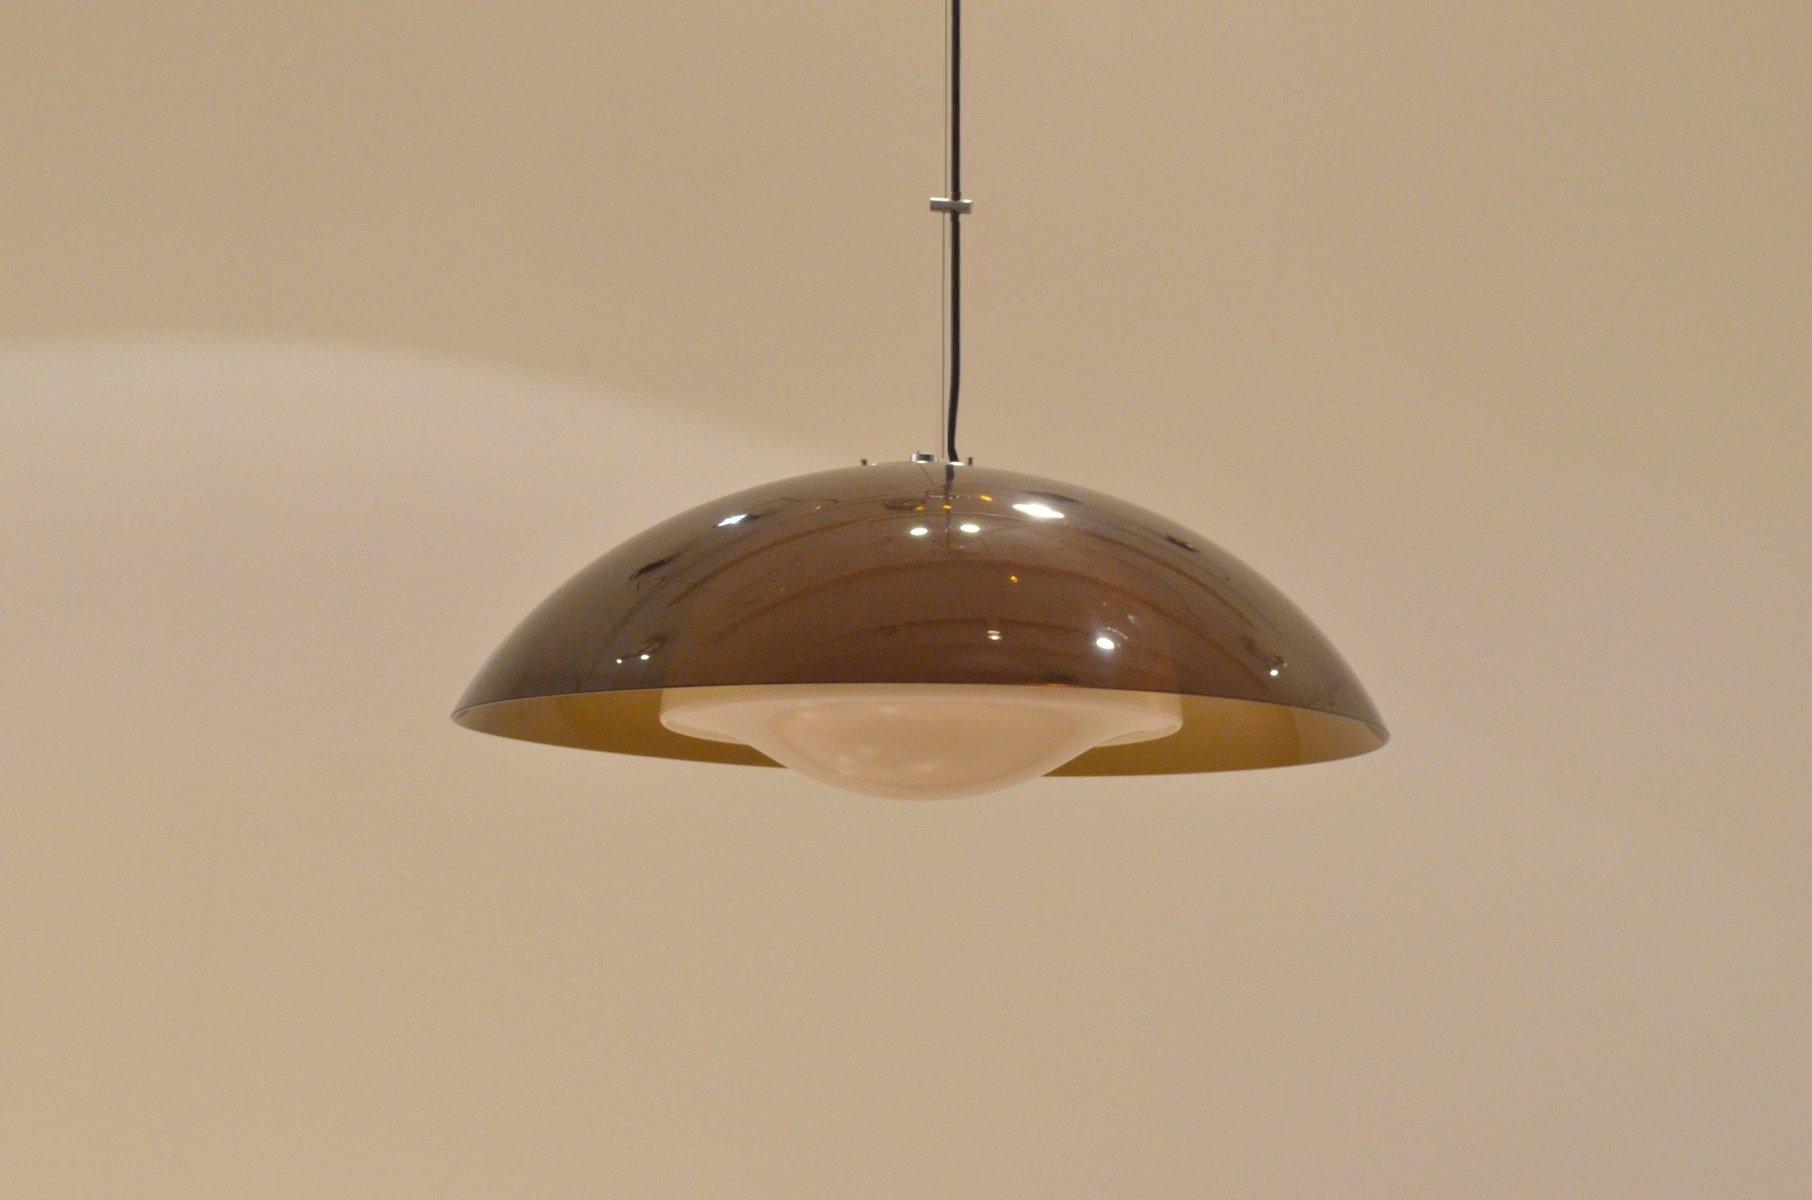 Lampade A Sospensione Vintage : Lampada a sospensione vintage in plexiglas di harvey guzzini per